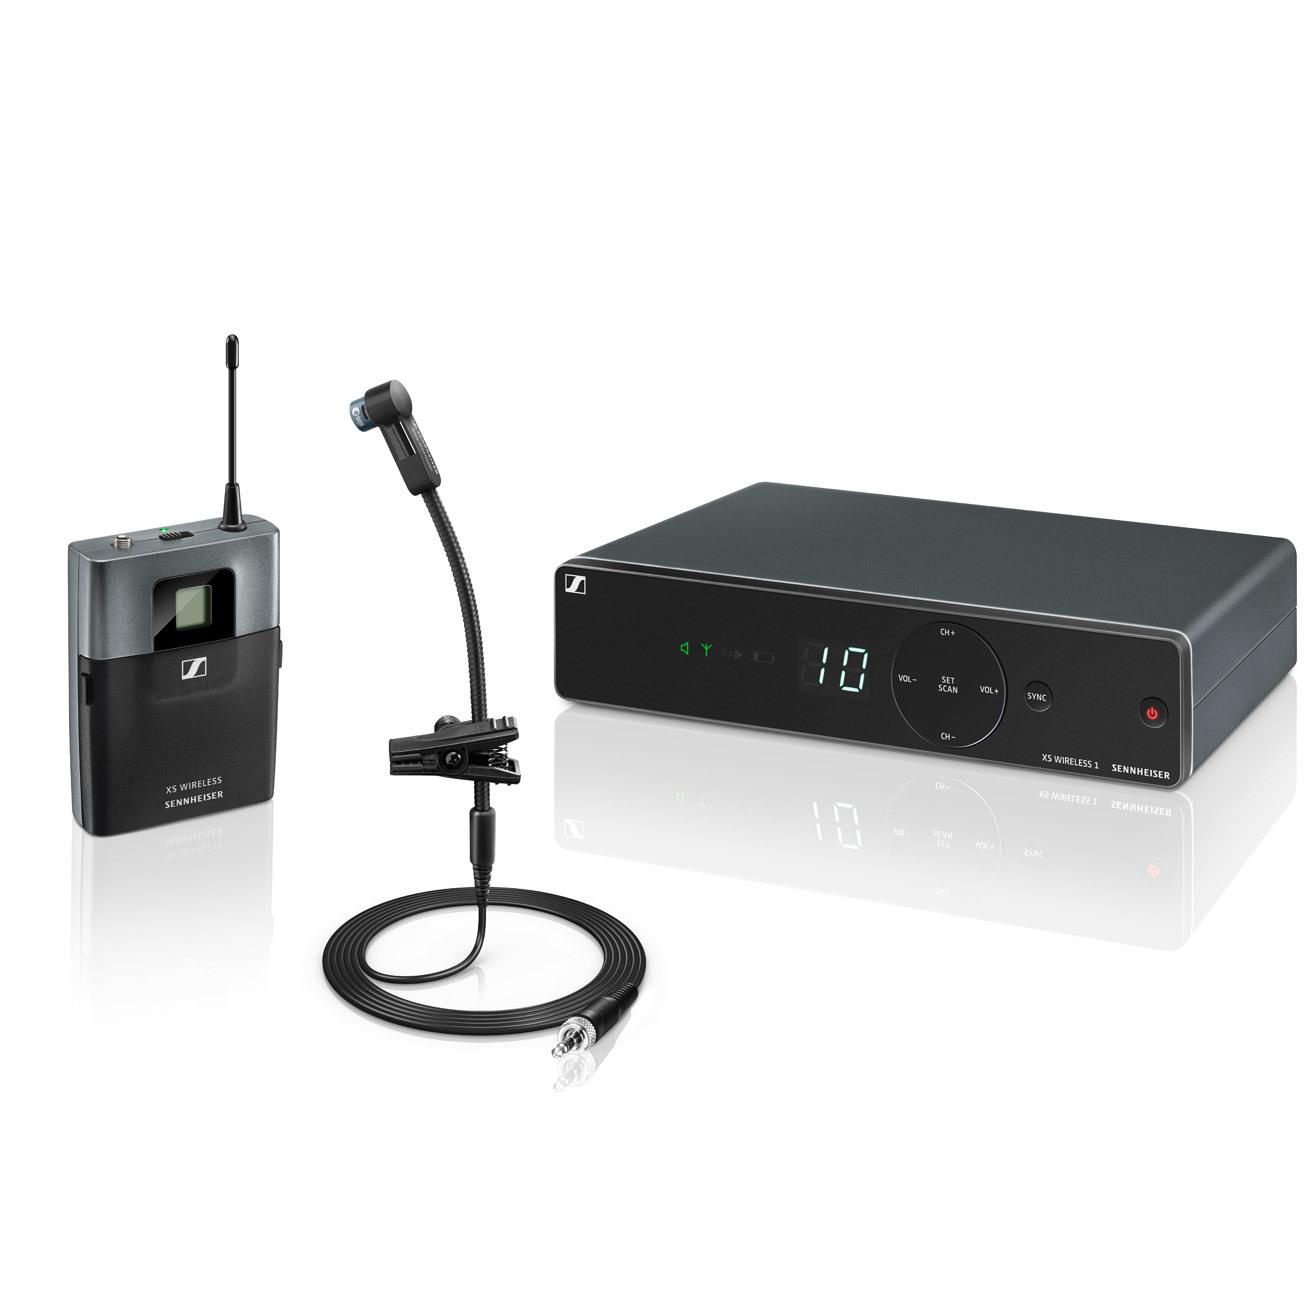 Sennheiser XSW 1-908 Wireless Instrument Microphone System – A Range